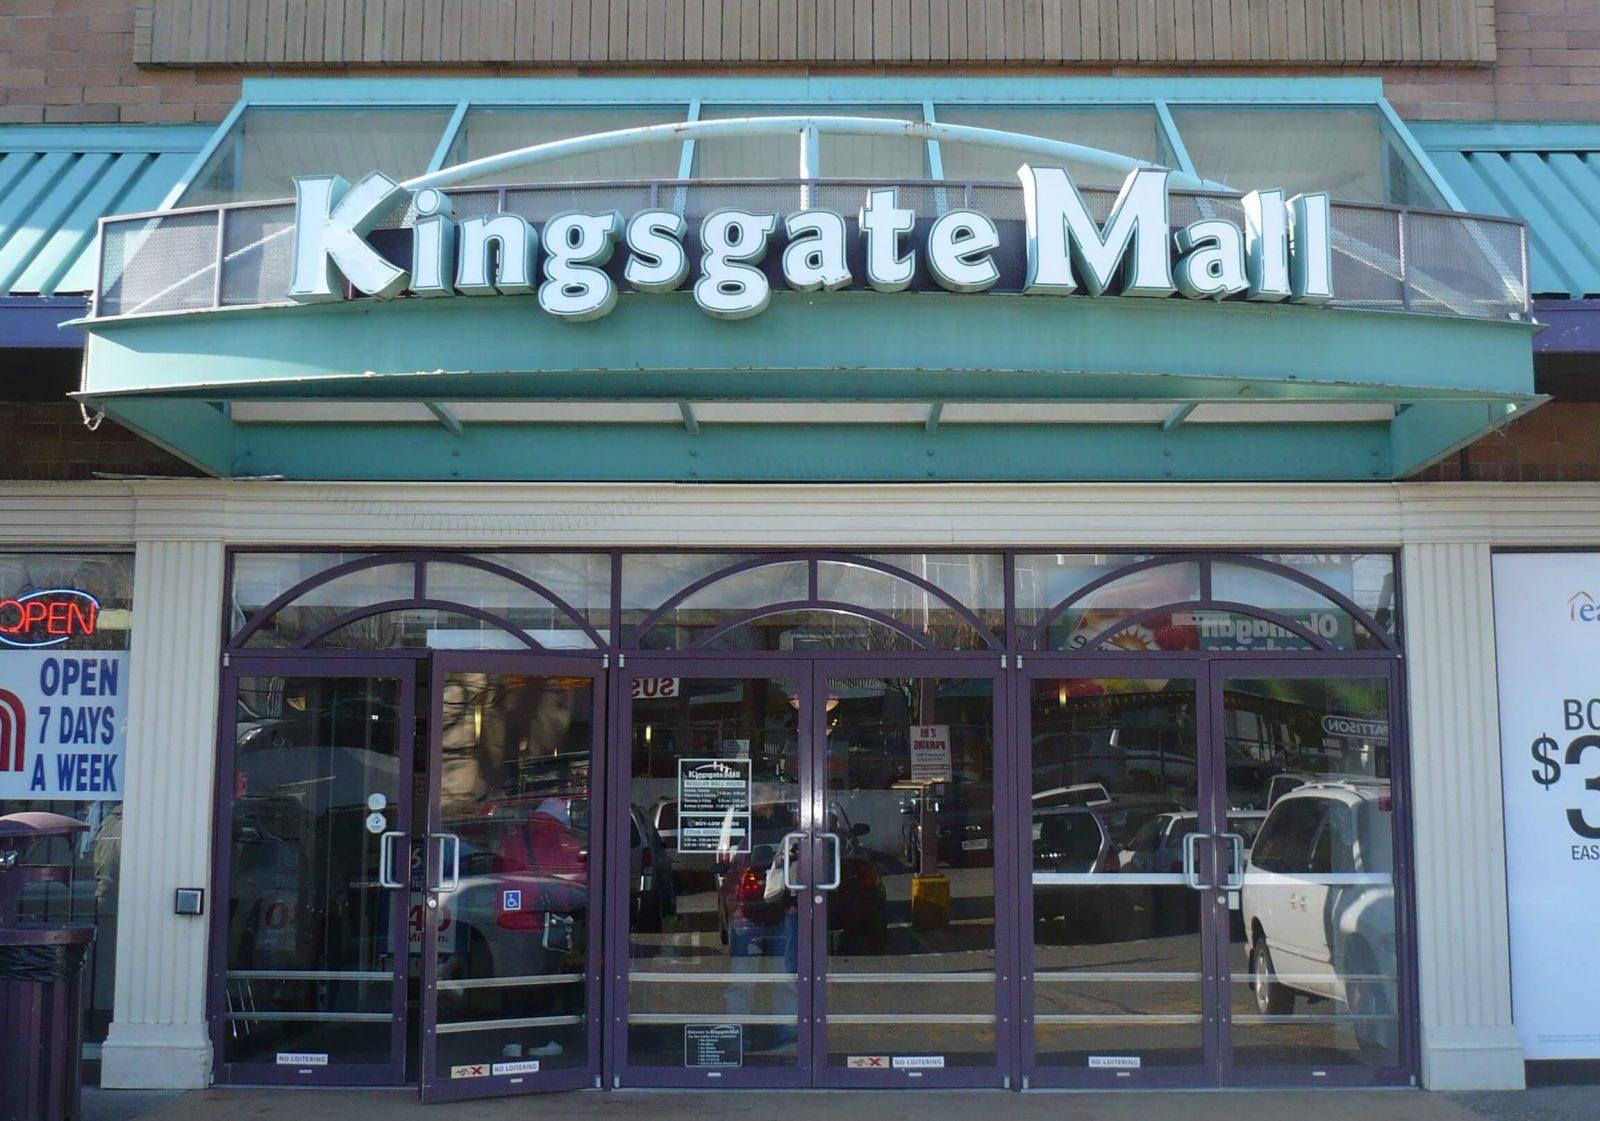 Kingsgate Mall, Mount Pleasant, Vancouver